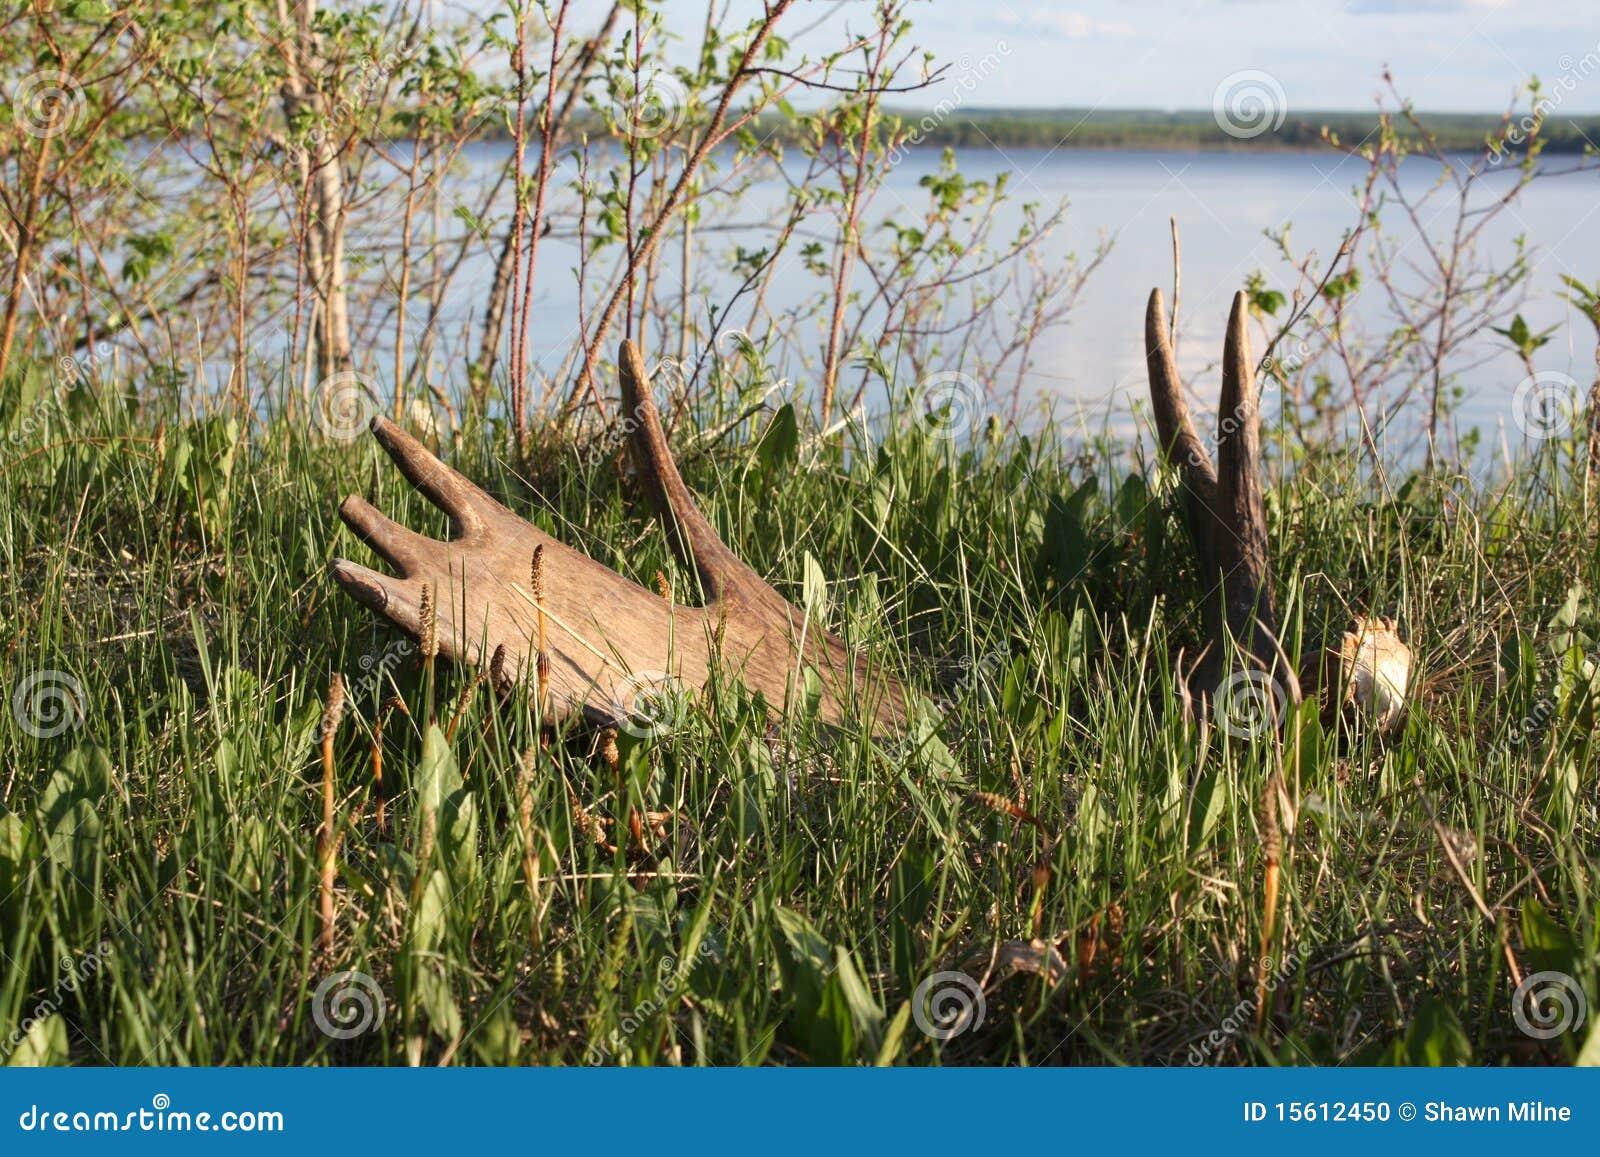 Moose Antlers Moose antler shed